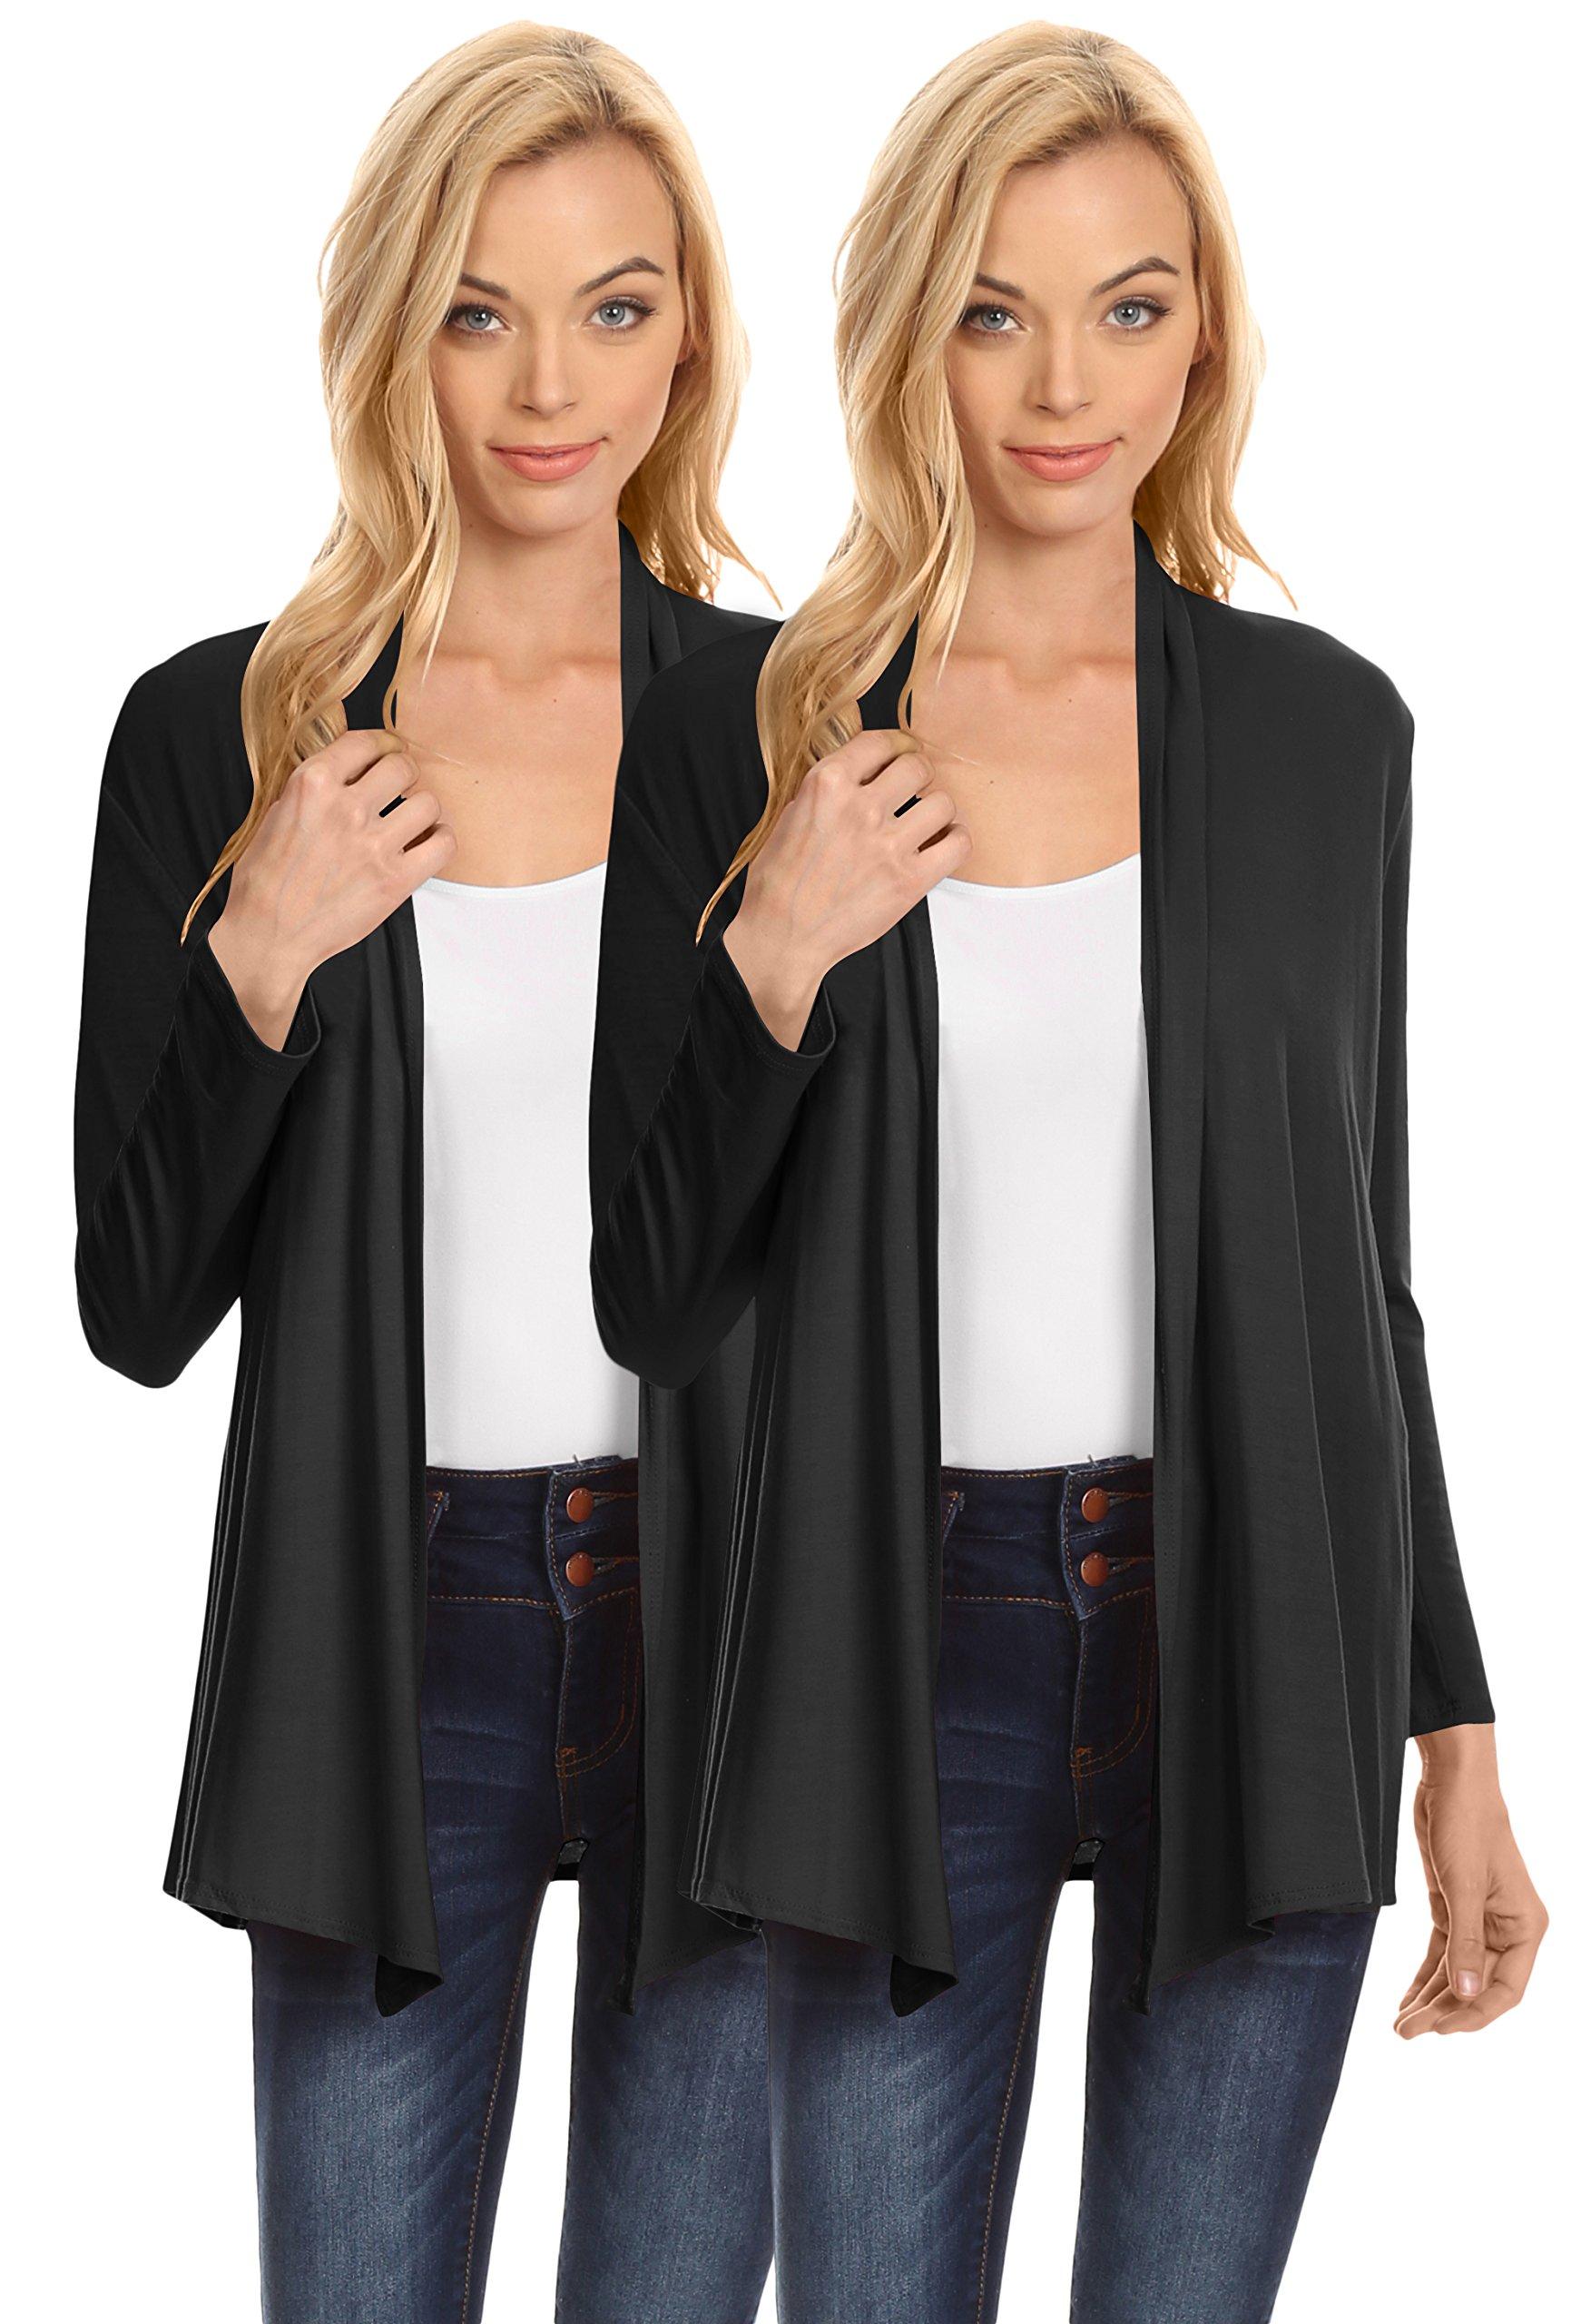 Womens Open Drape Cardigan Reg and Plus Size Cardigan Sweater Long Sleeves - USA (Size Medium, 2 Pk Black/Black)